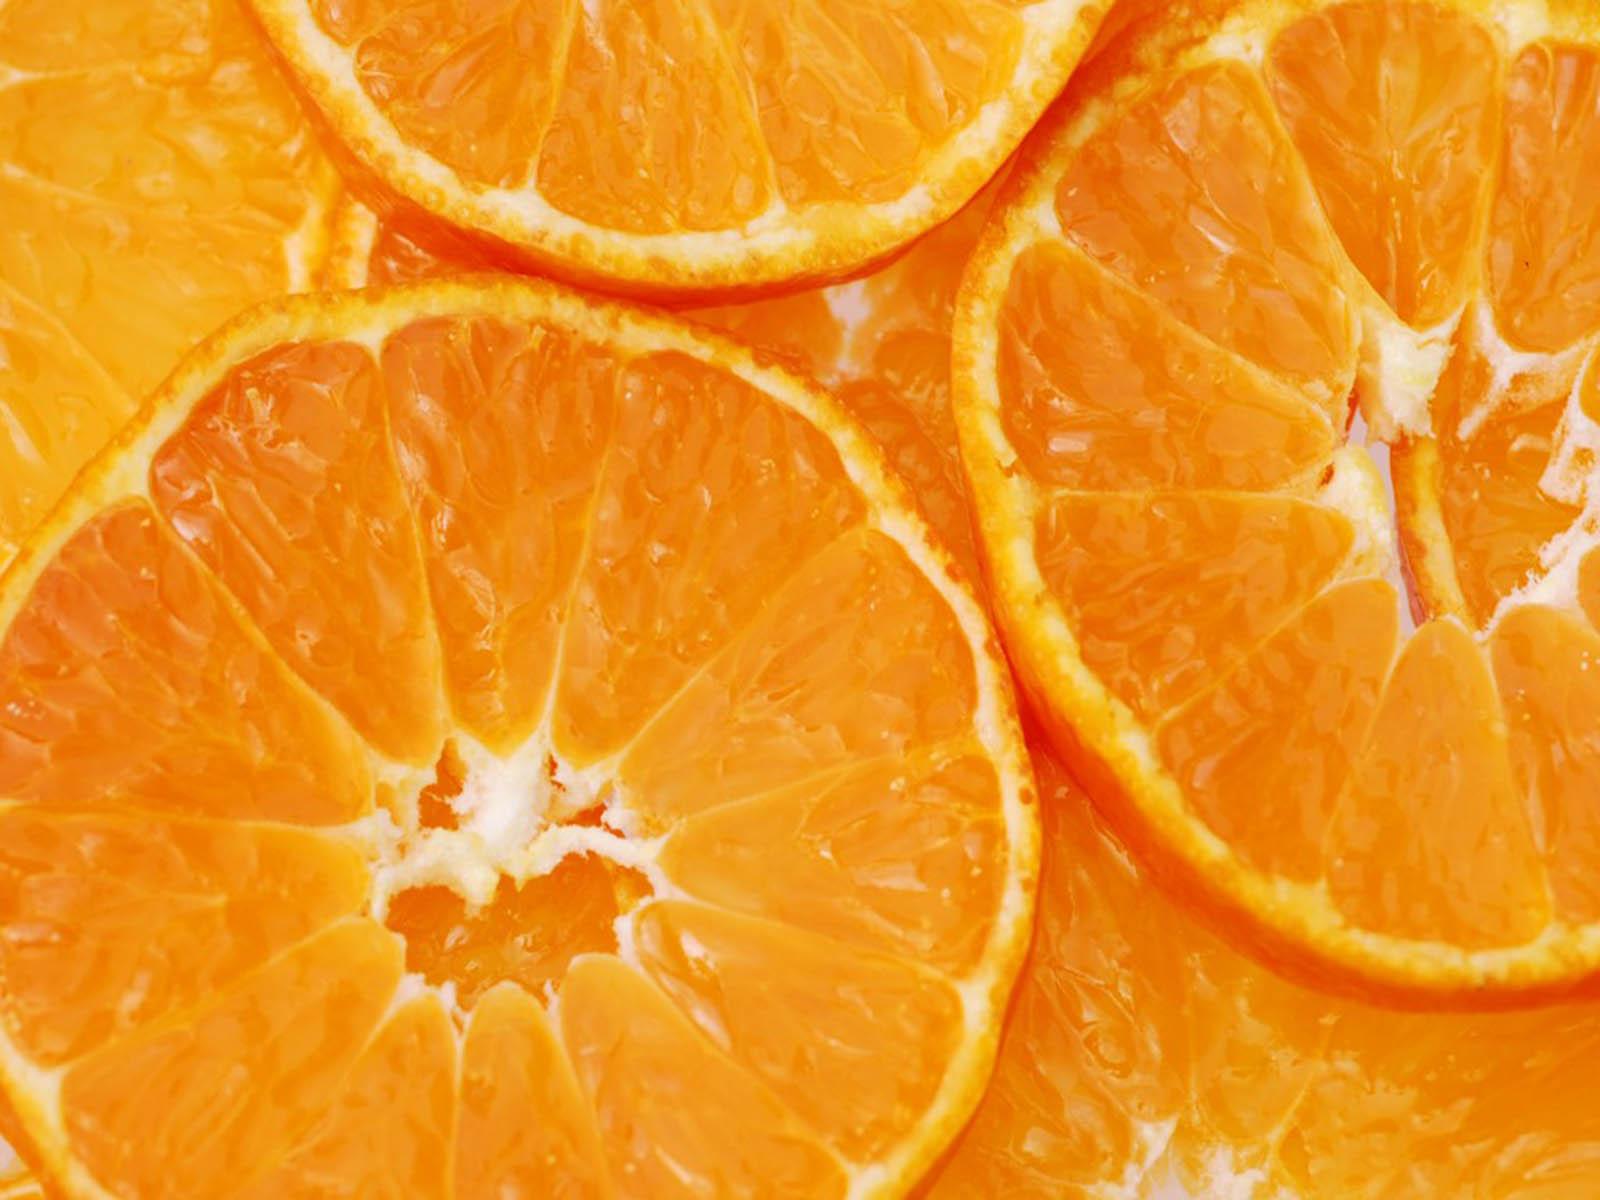 wallpapers orange fruits wallpapers On orange wallpaper